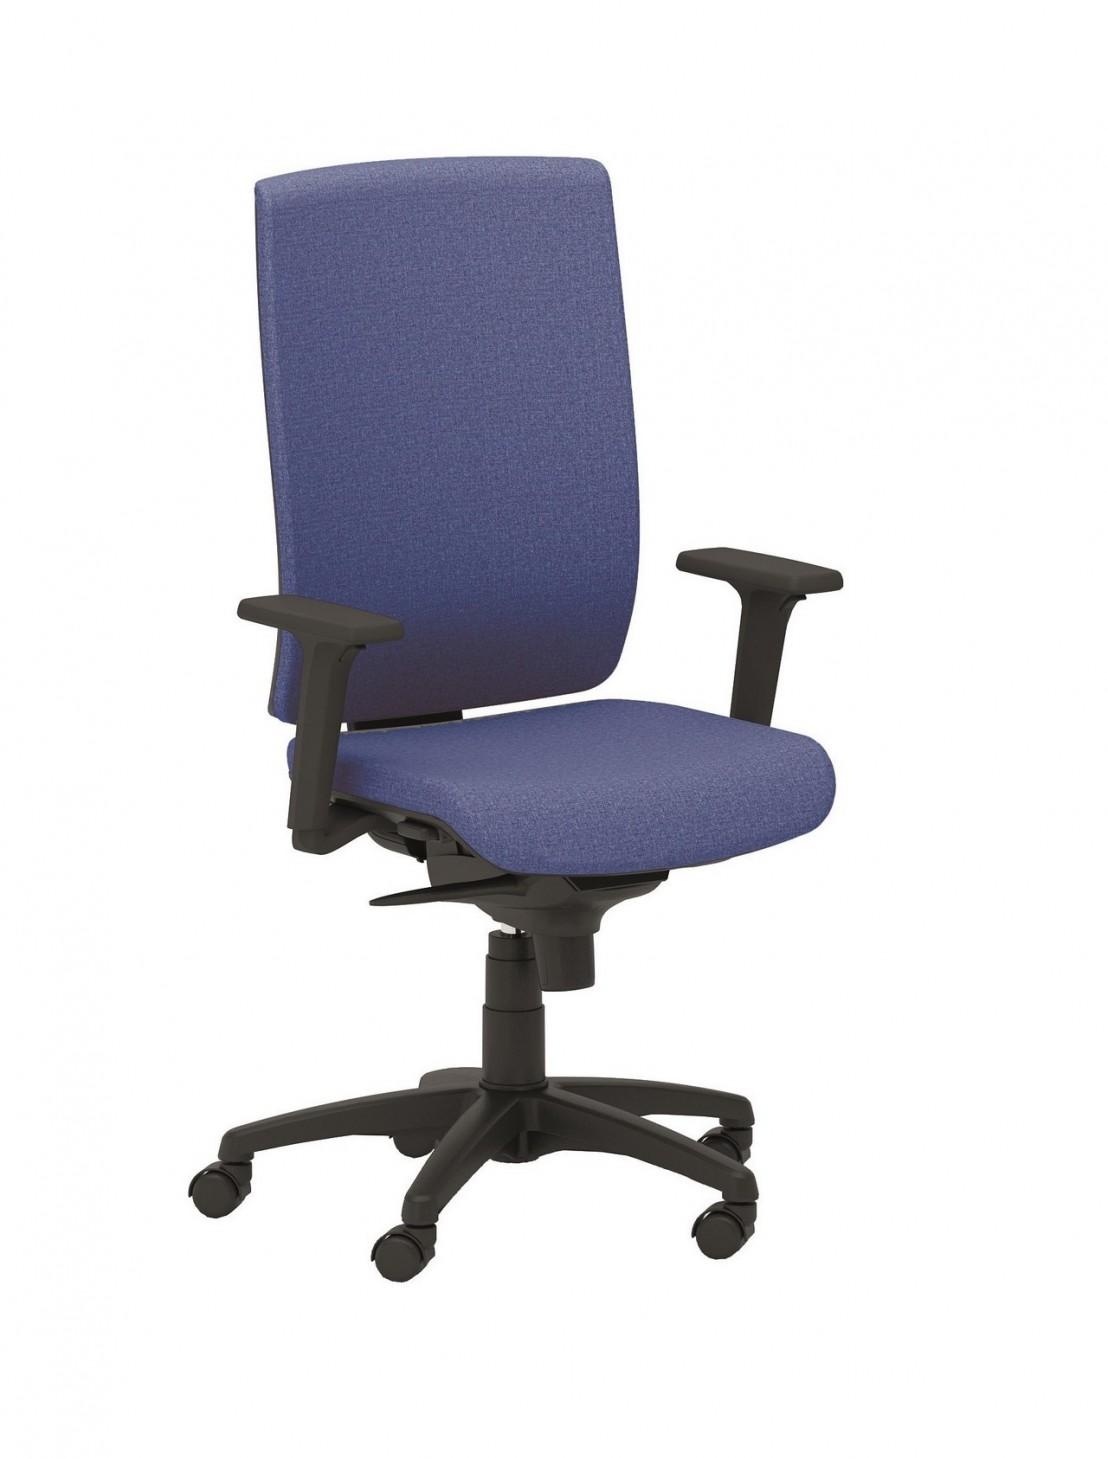 Office 205 fauteuil de bureau en cuir ou en tissu seanroyale - Fauteuil de bureau en solde ...